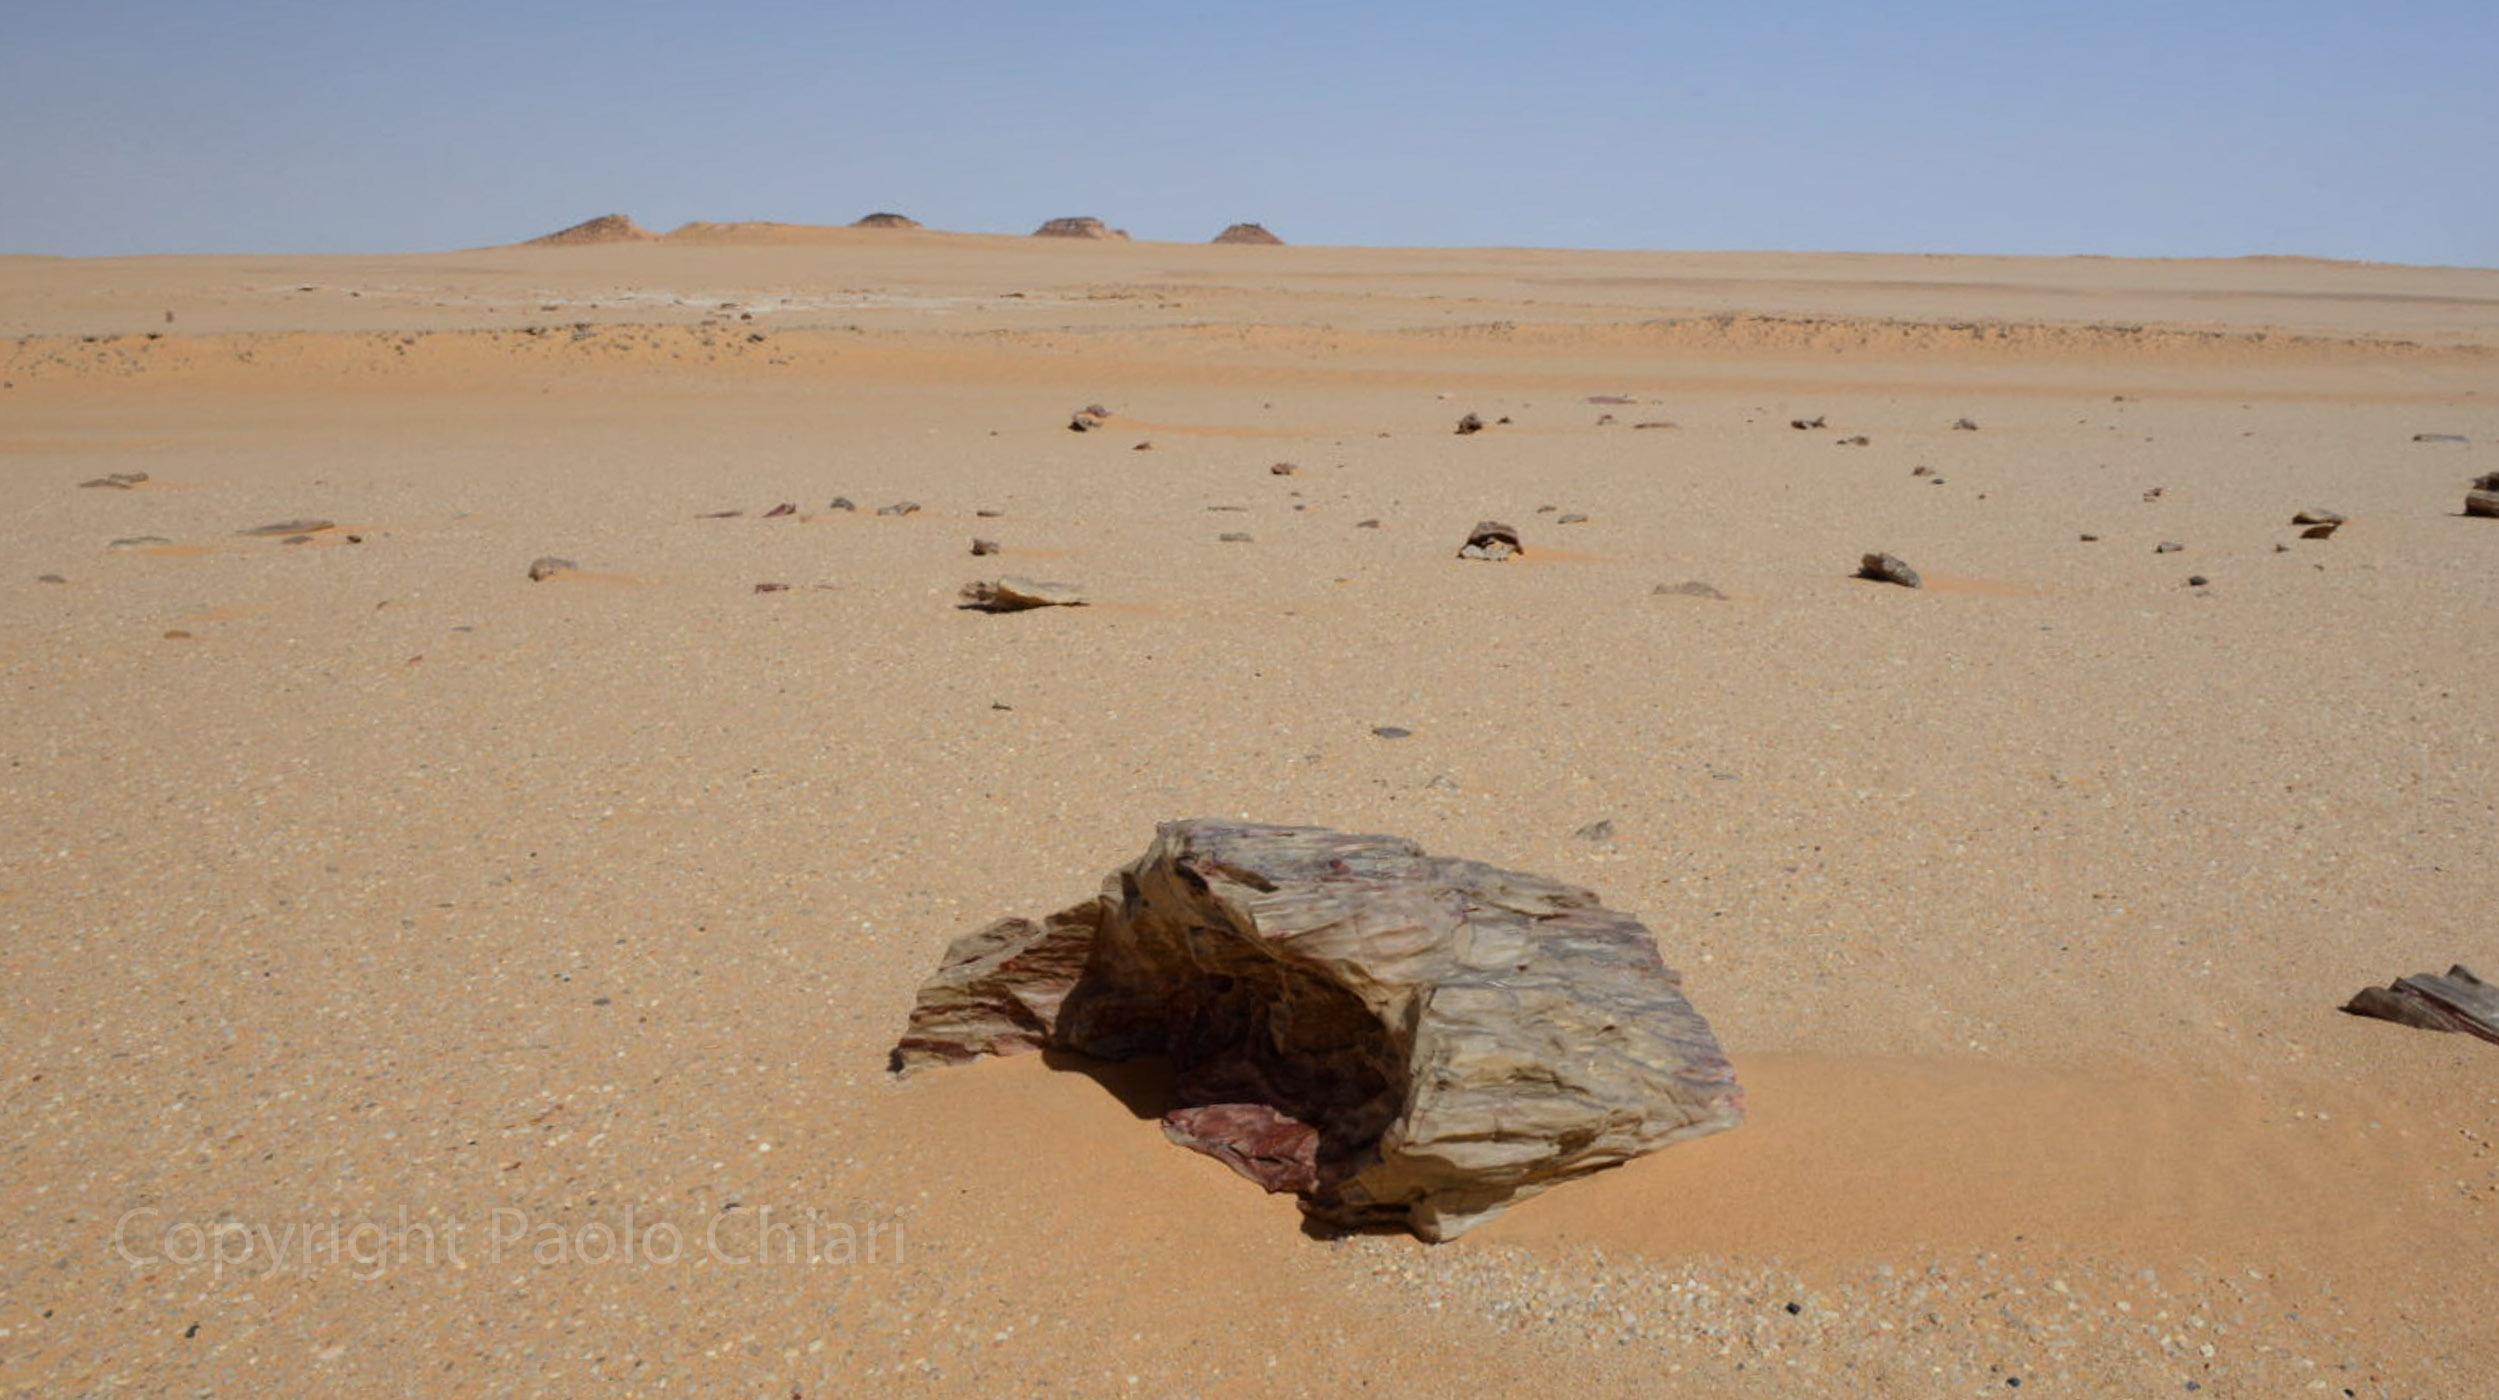 Sudan2013_0698